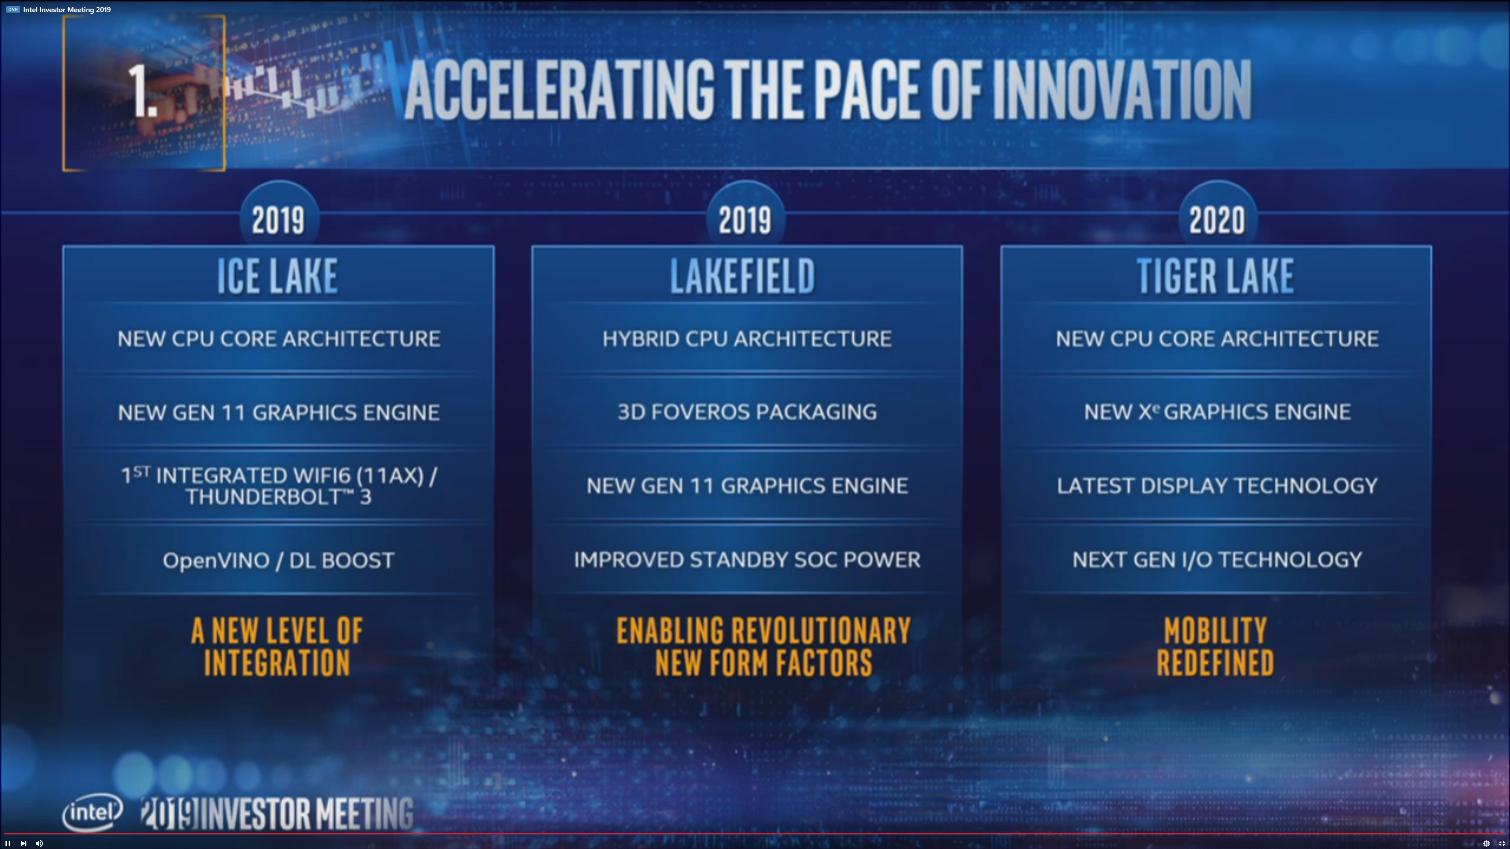 Best Cpu 2020.Intel Announces 10nm Tiger Lake Processors To Arrive In 2020